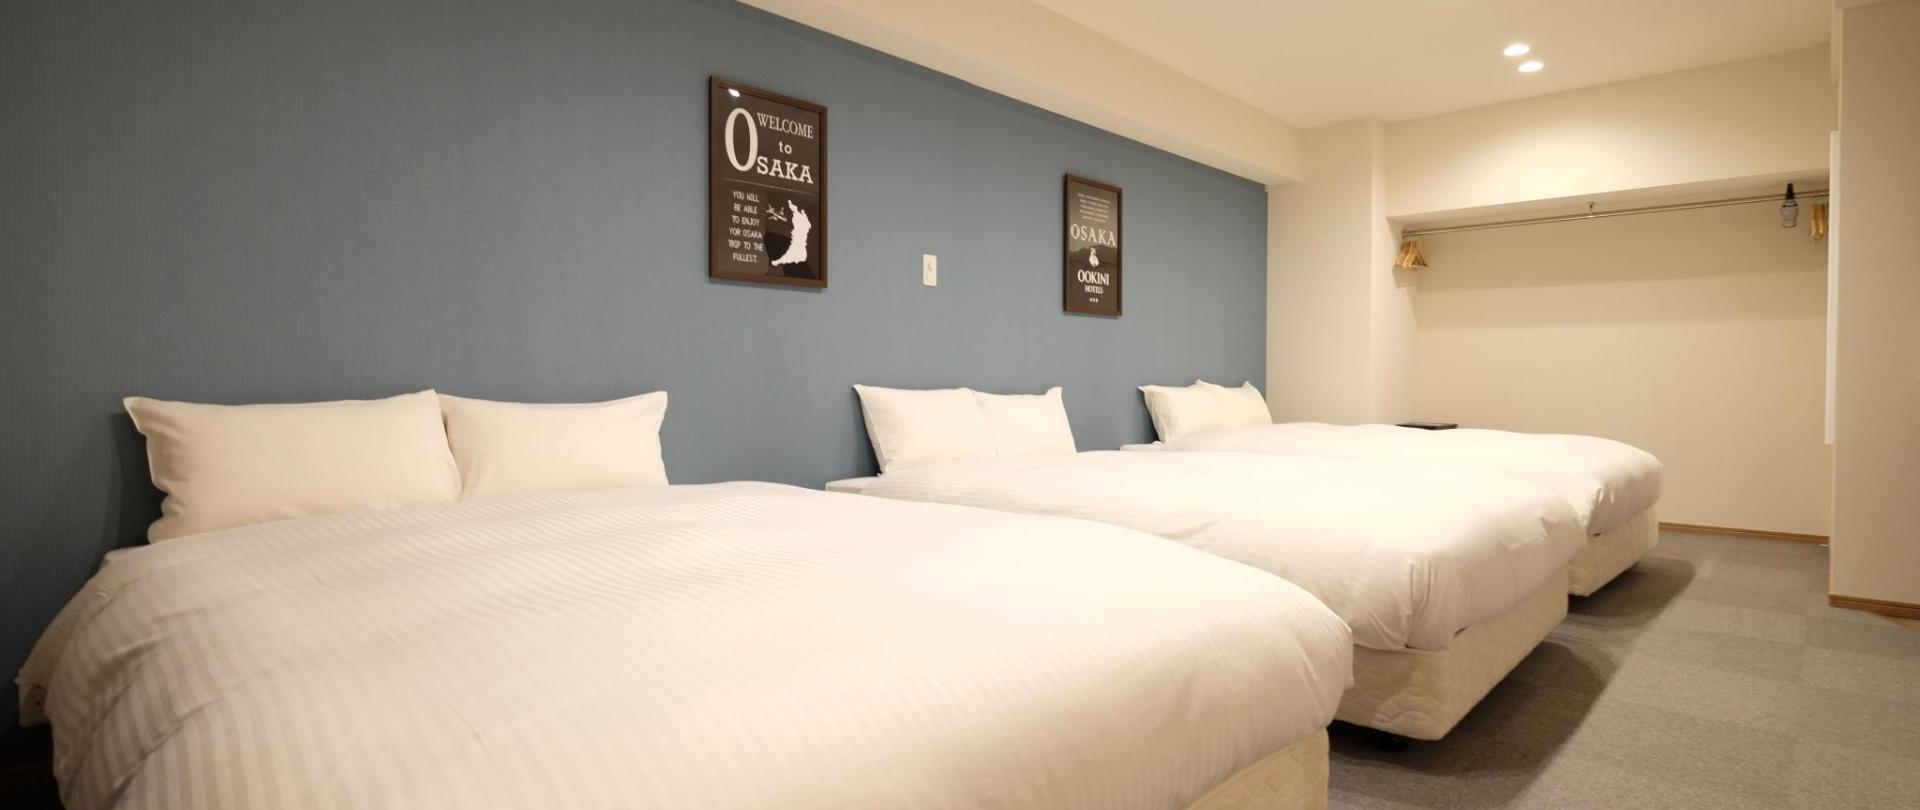 OOKINI HOTELS Dotonbori Apartment